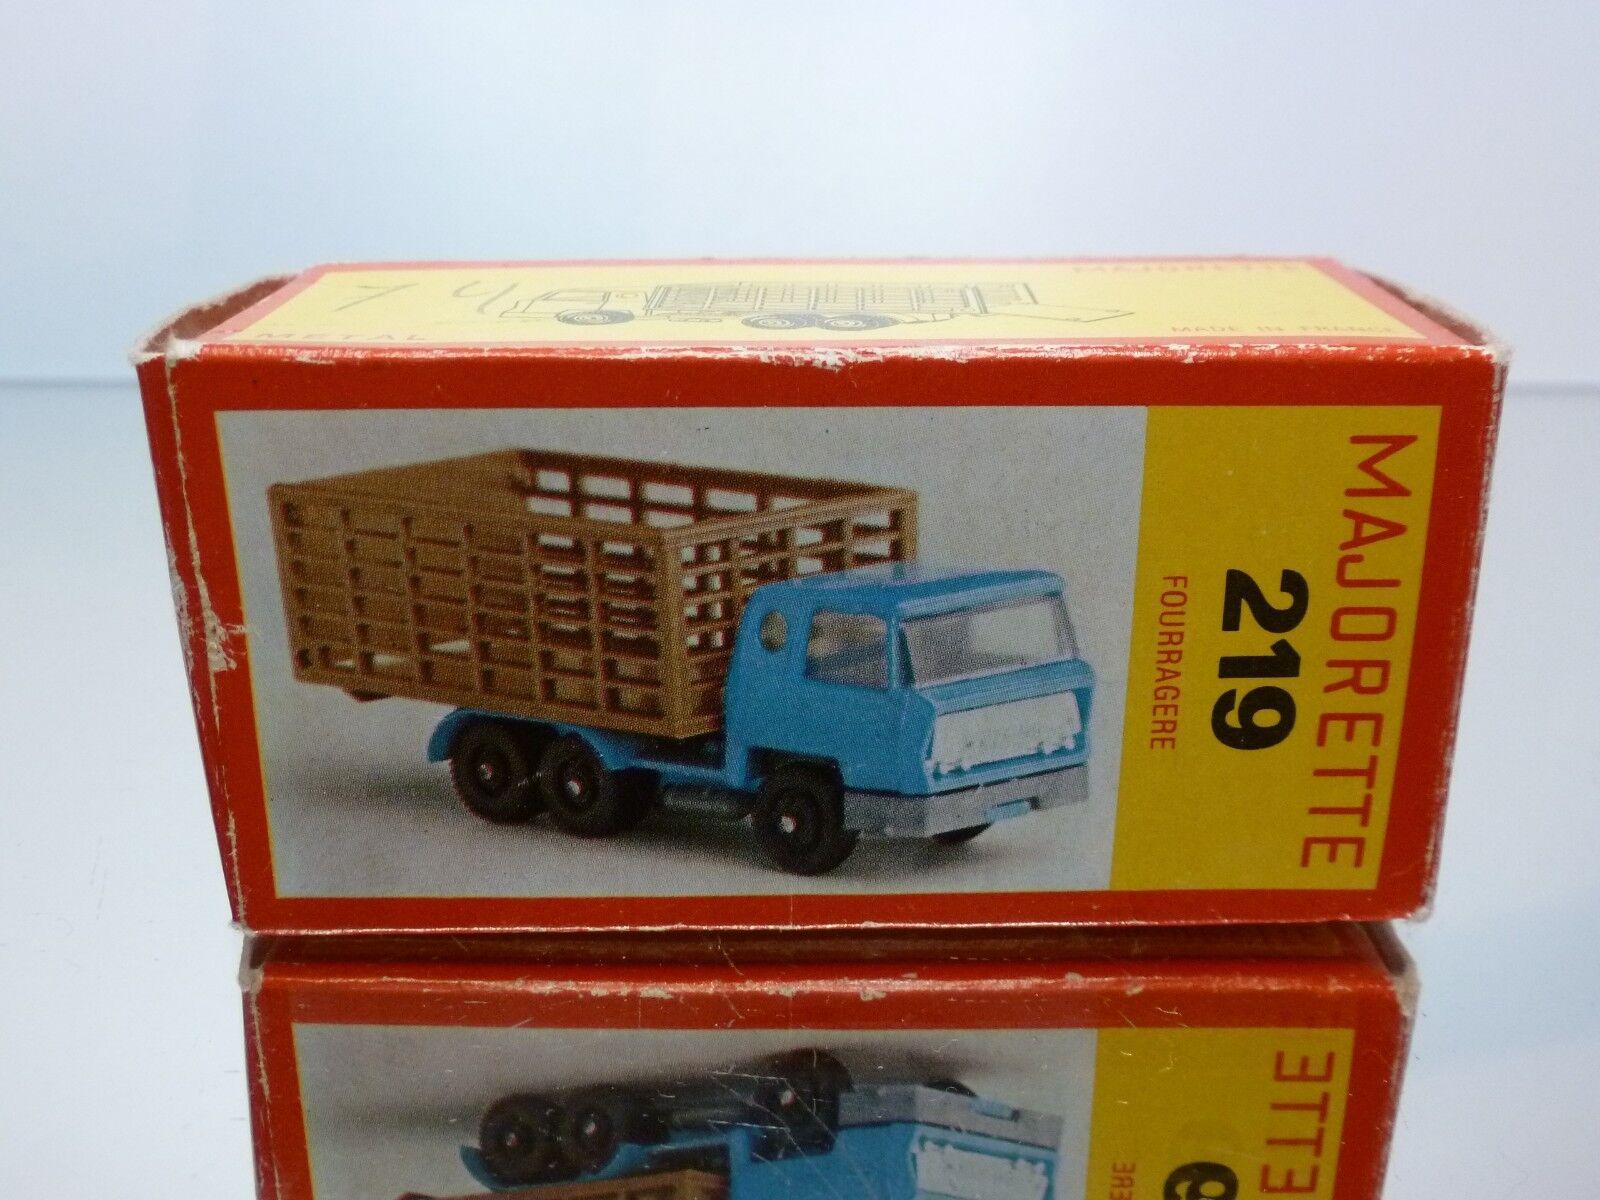 MAJORETTE 219 BOX for DAF 2600 ANIMAL TRANSPORTER - FOURRAGERE 1 100 - ONLY BOX